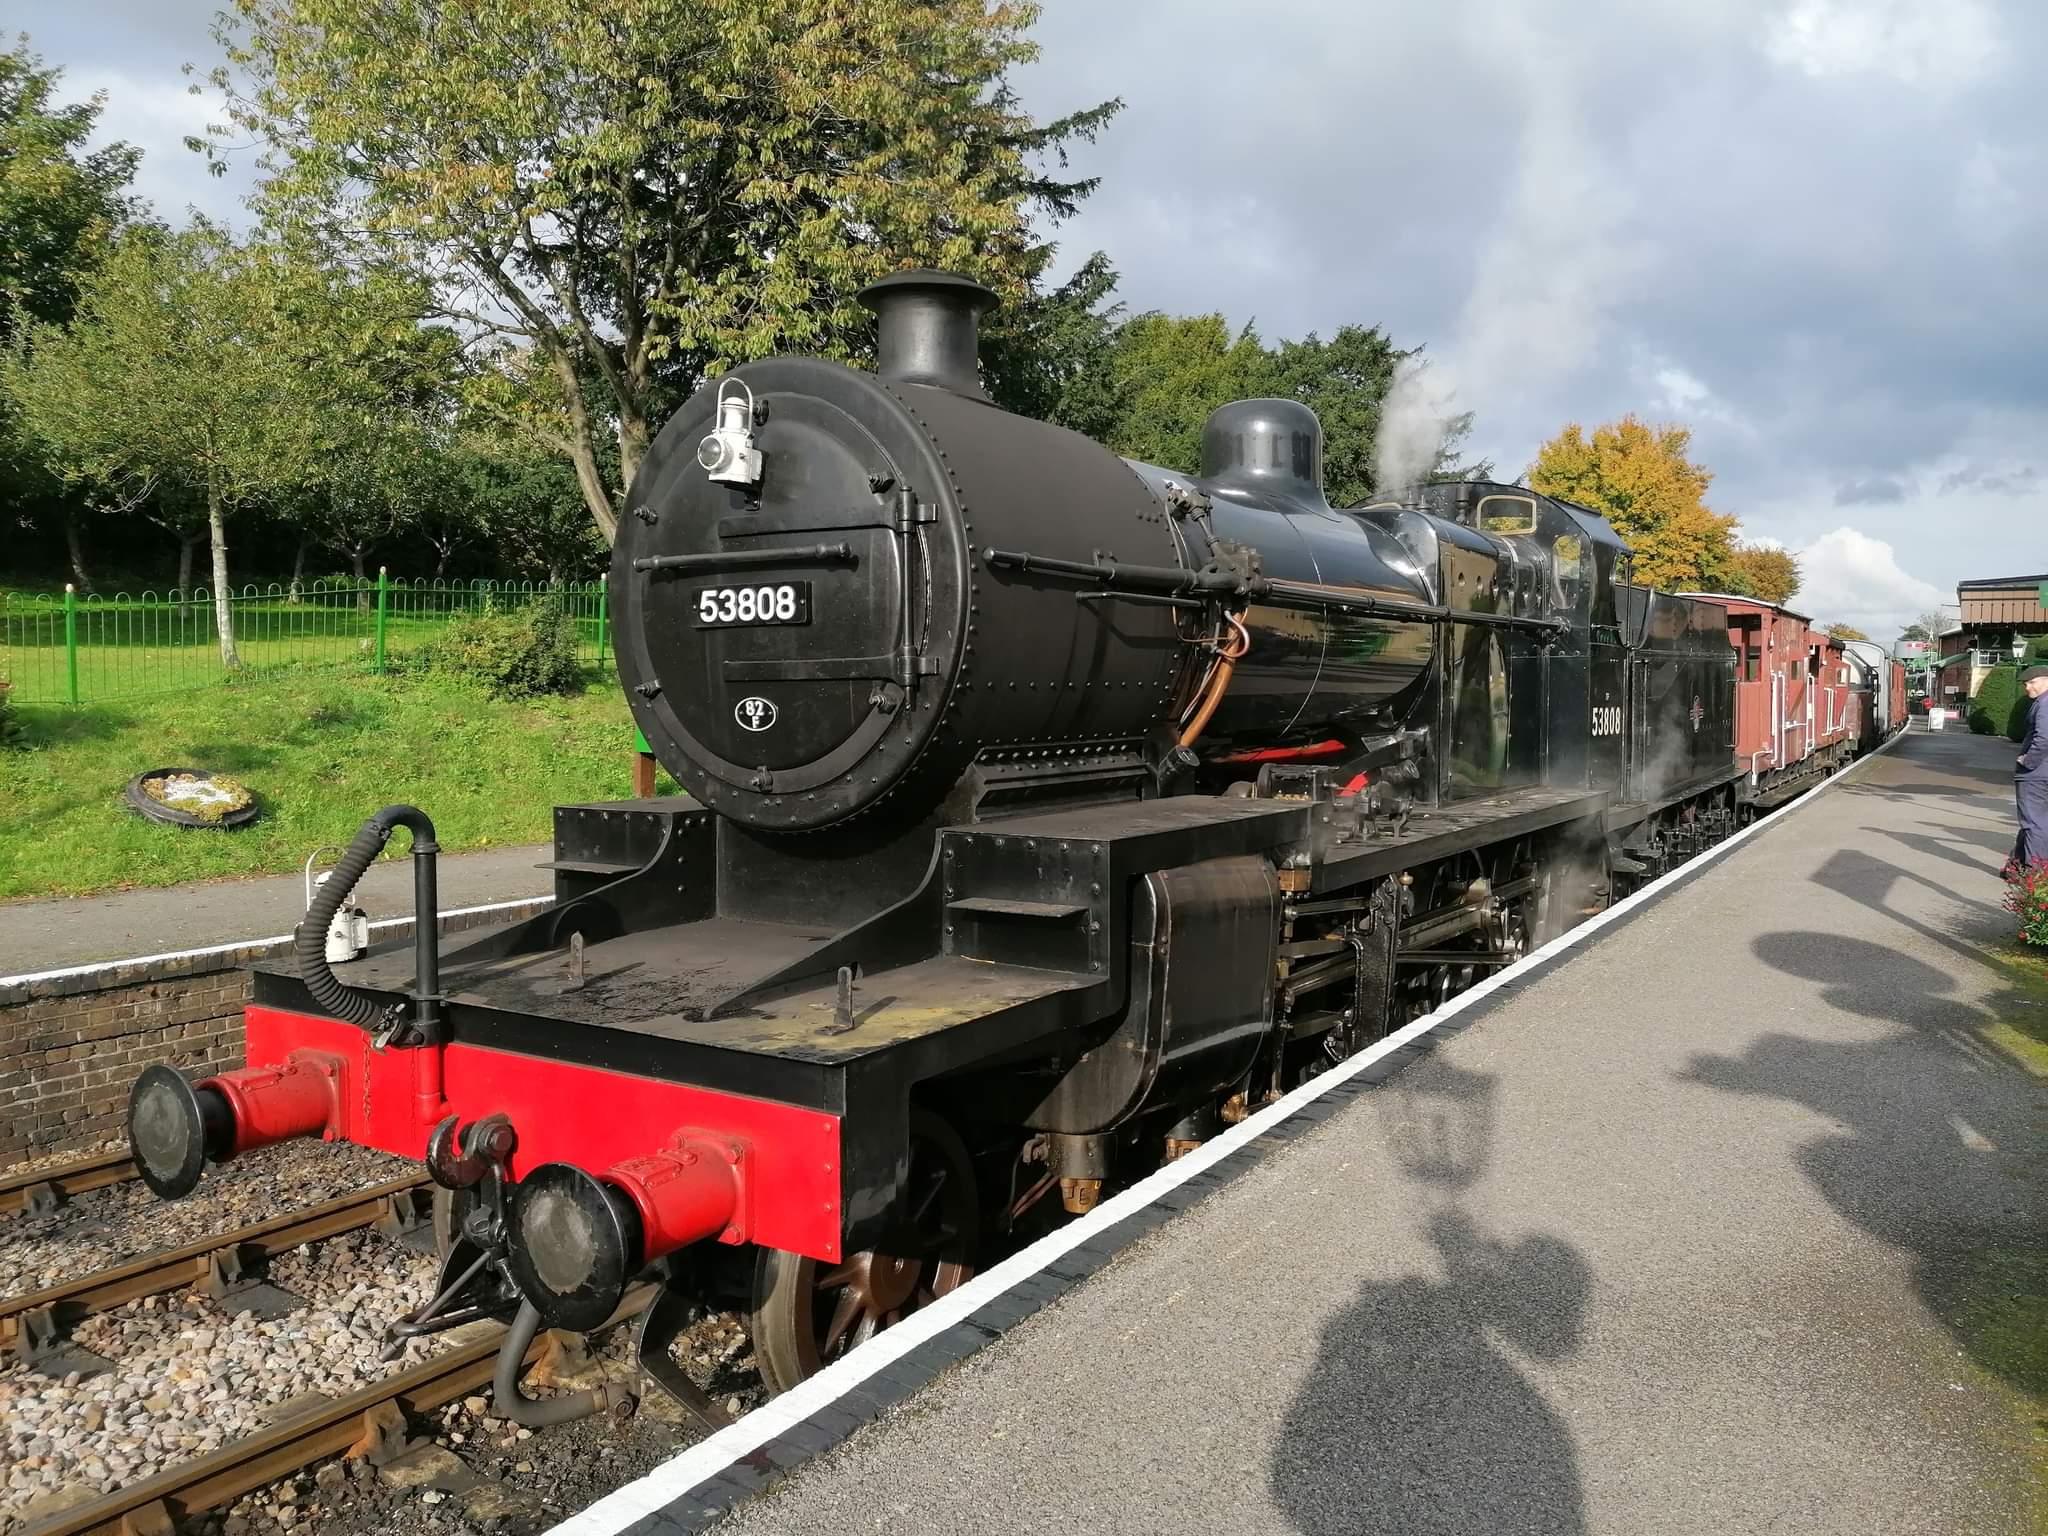 53808 at the platform at Ropley on 14 October.